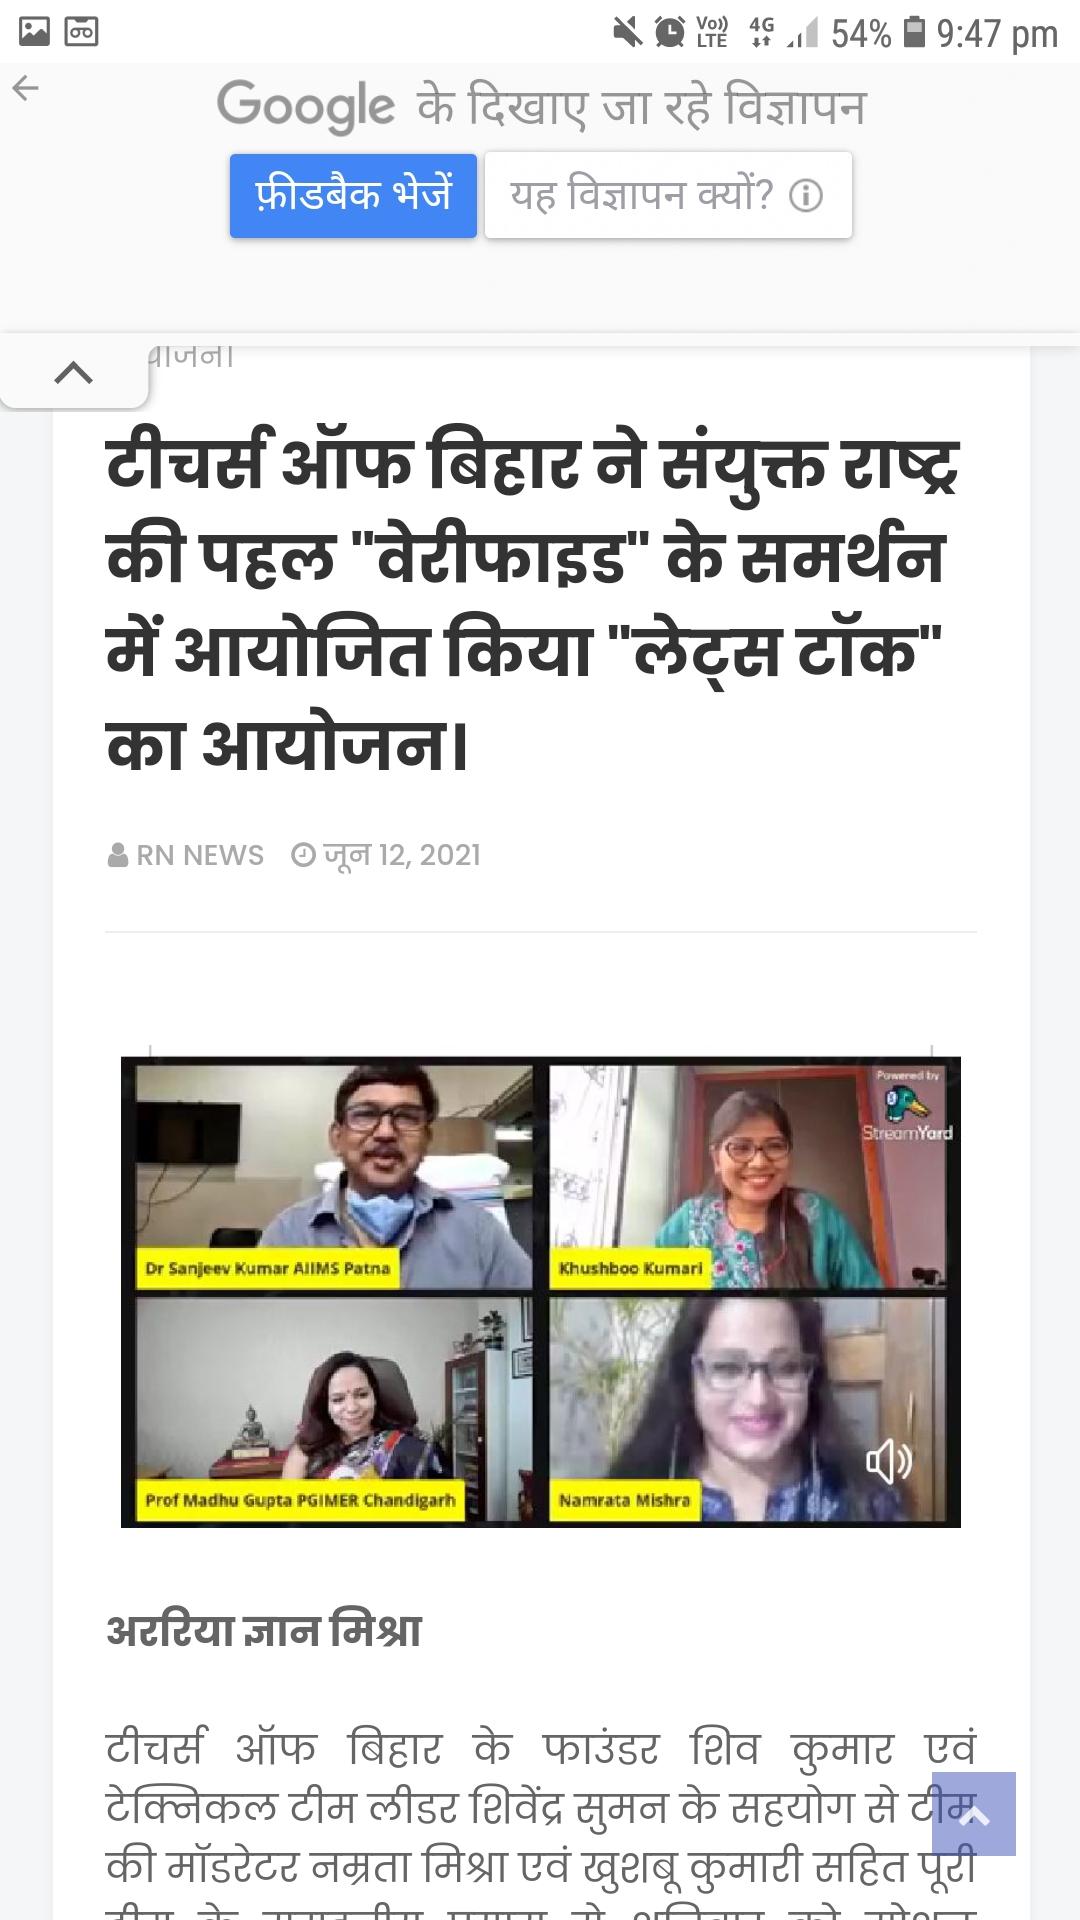 Let's Talk program on covind 19 & vaccination , 12-06-2021